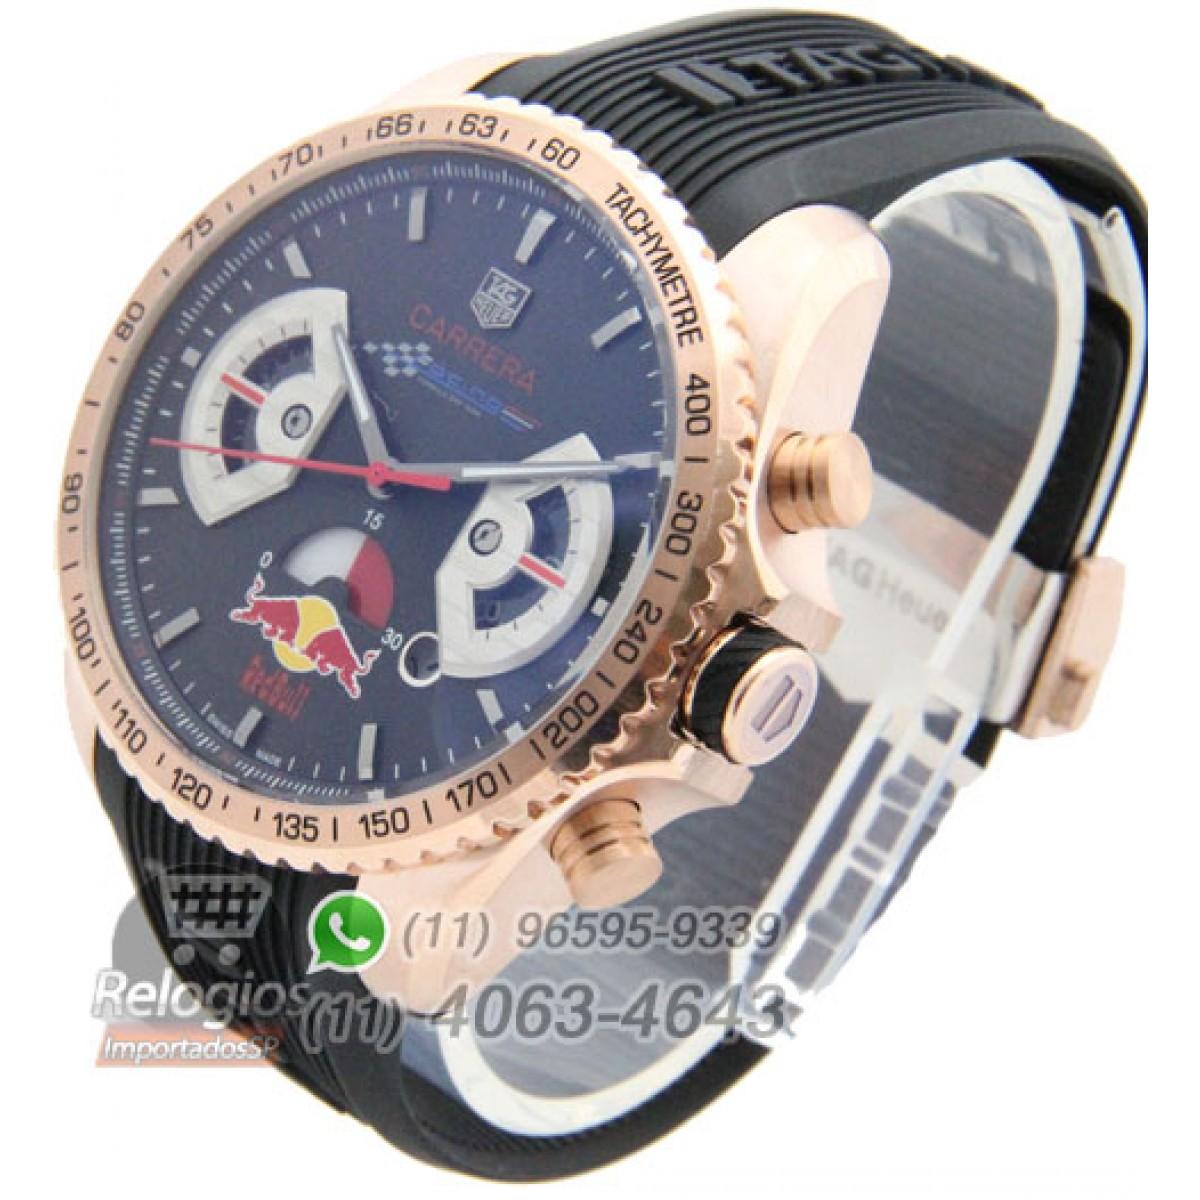 b4223f32440 Relógio Réplica Tag Heuer Carrera Red Bull Rosê Preto